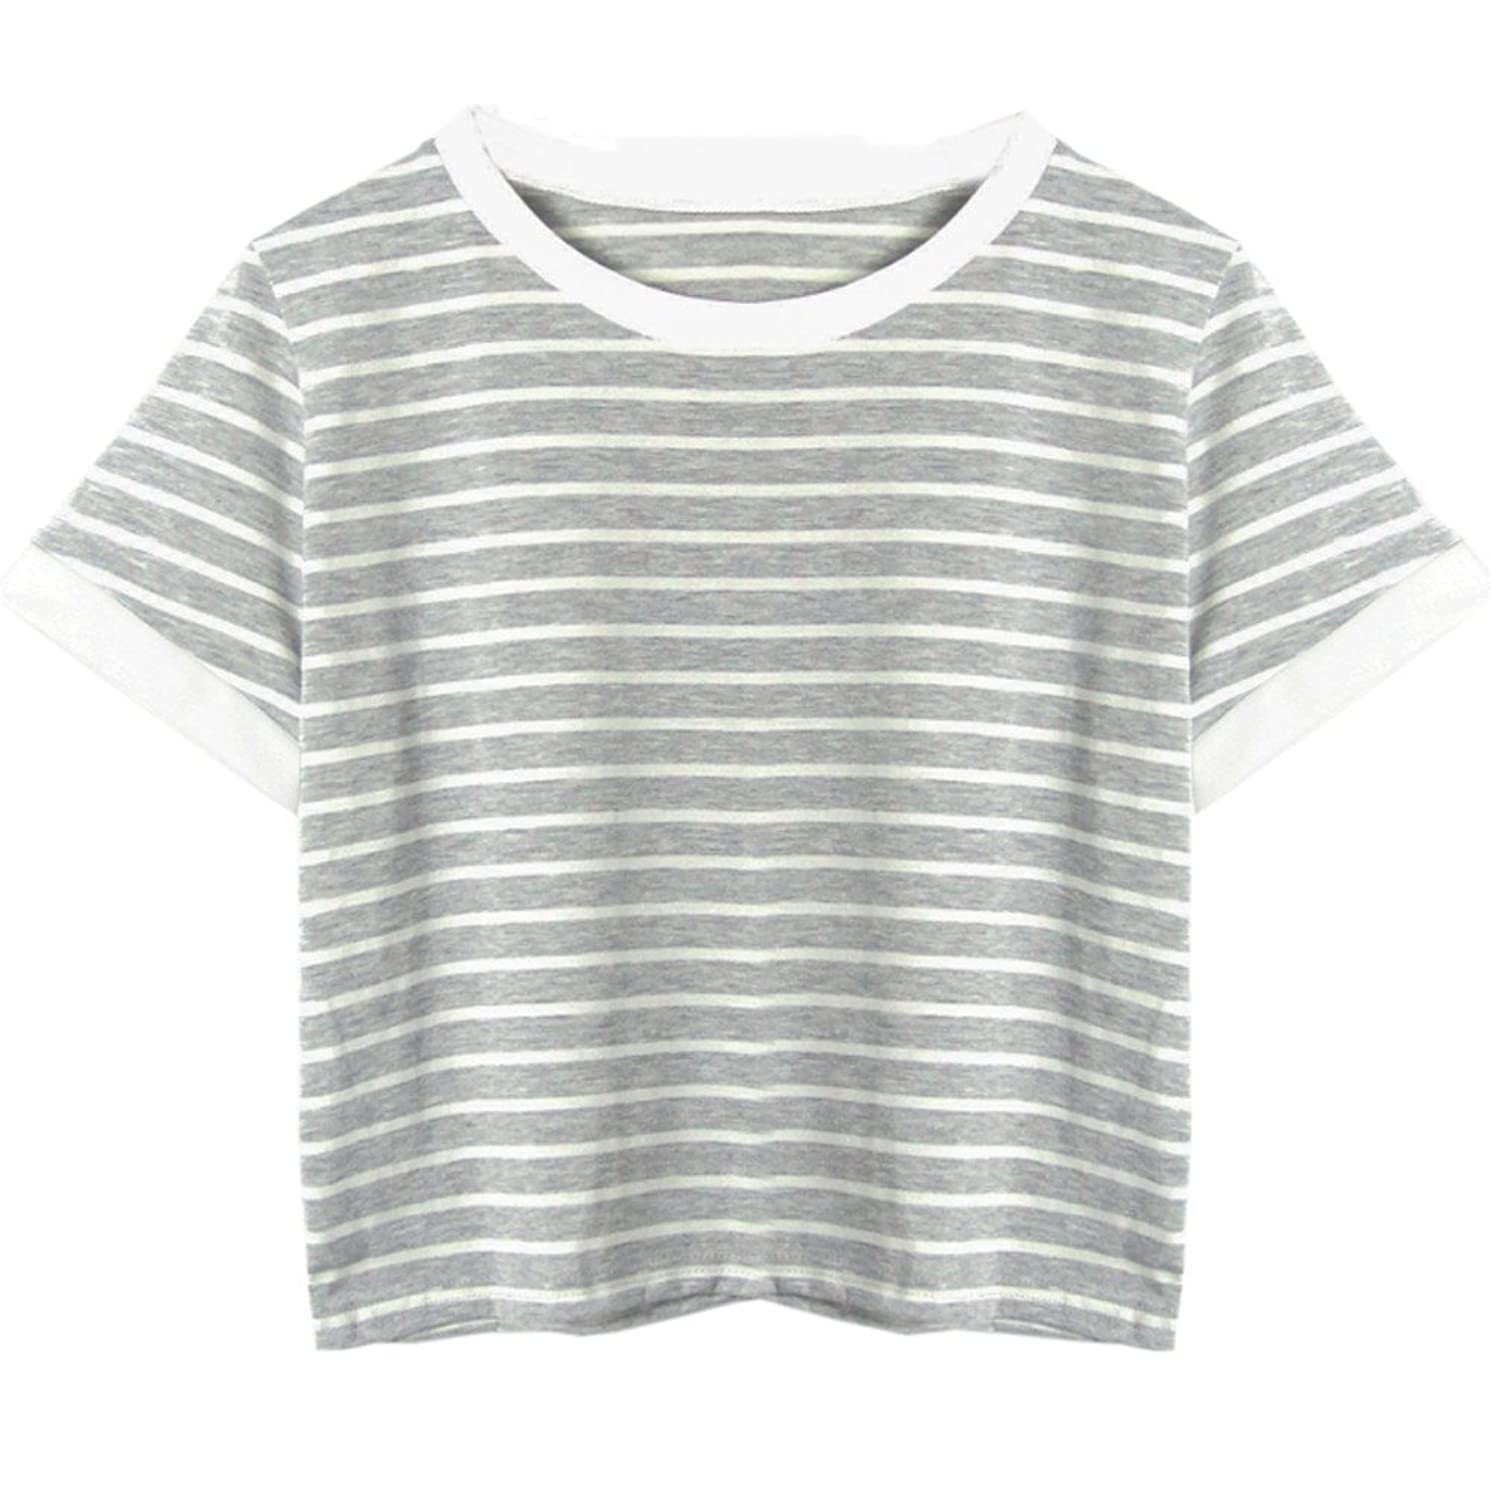 Hengshikeji Women O-Neck Striped Crop Top Short Sleeve Blouse Casual Shirt Teen Girls Tunic Jumper for Summer